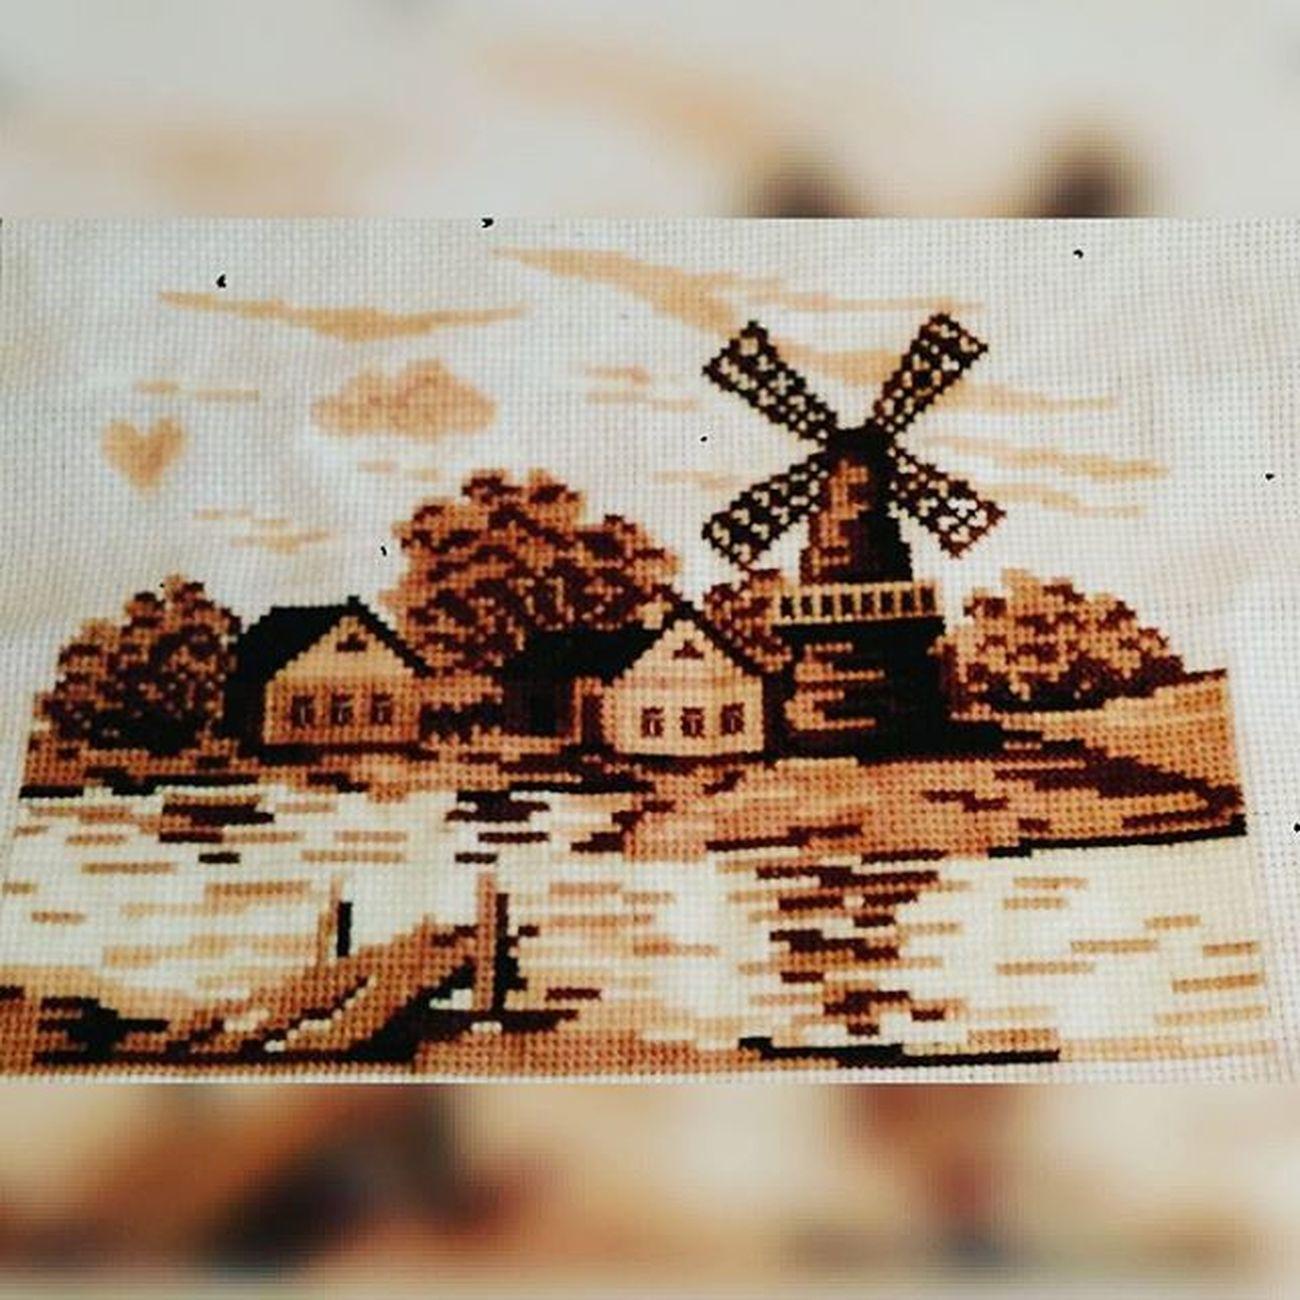 вышивка рукоделие мояработа МоеХобби Мельница домики домик облака Закат сепия деревня Коричневый оранжевый Embroidery Needlework Myhobby Houses House Sunset Mill Sepia крестик Cross Village